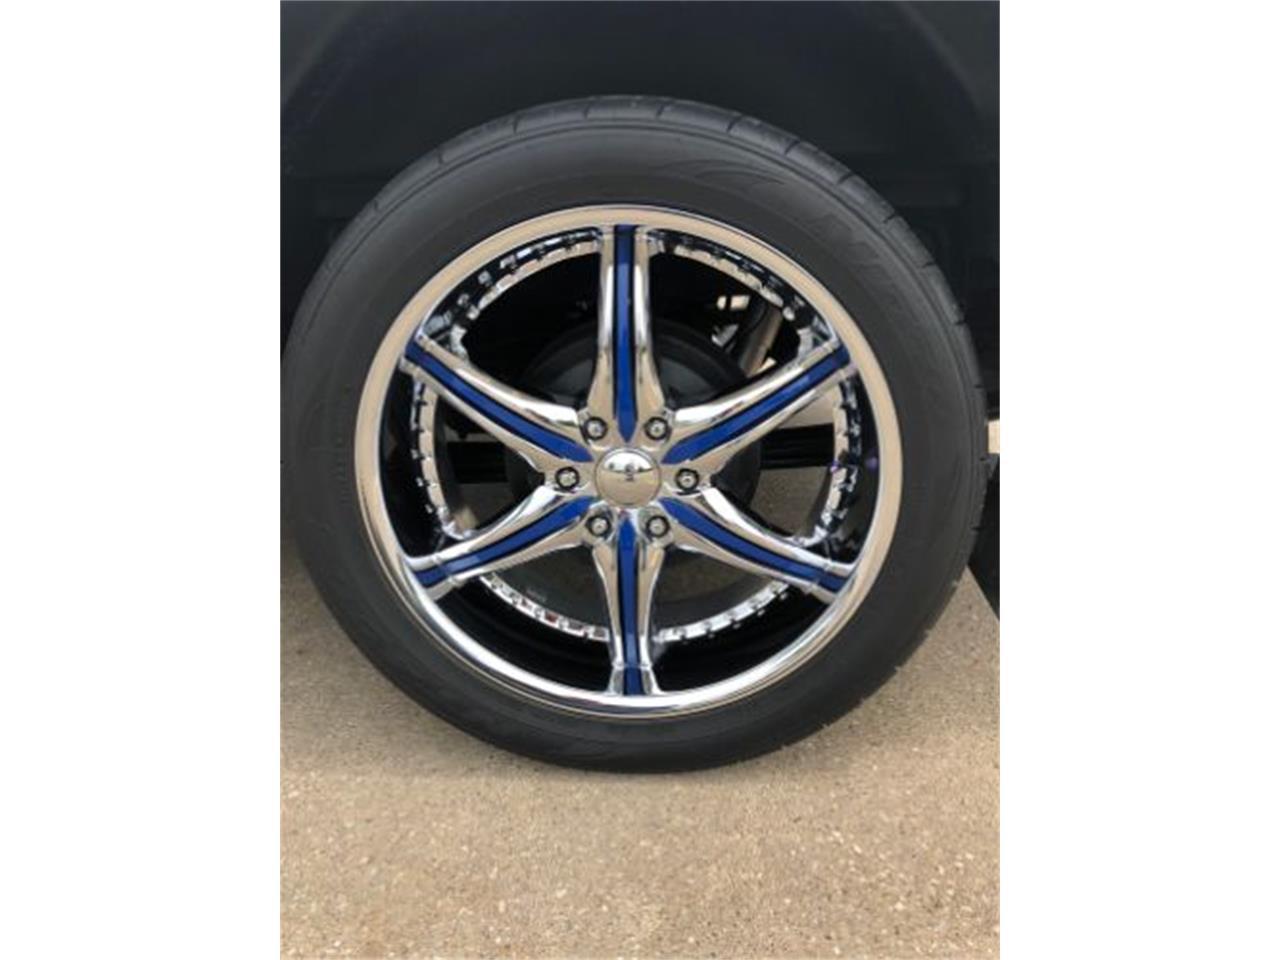 2011 Chevrolet Silverado (CC-1313943) for sale in Cadillac, Michigan